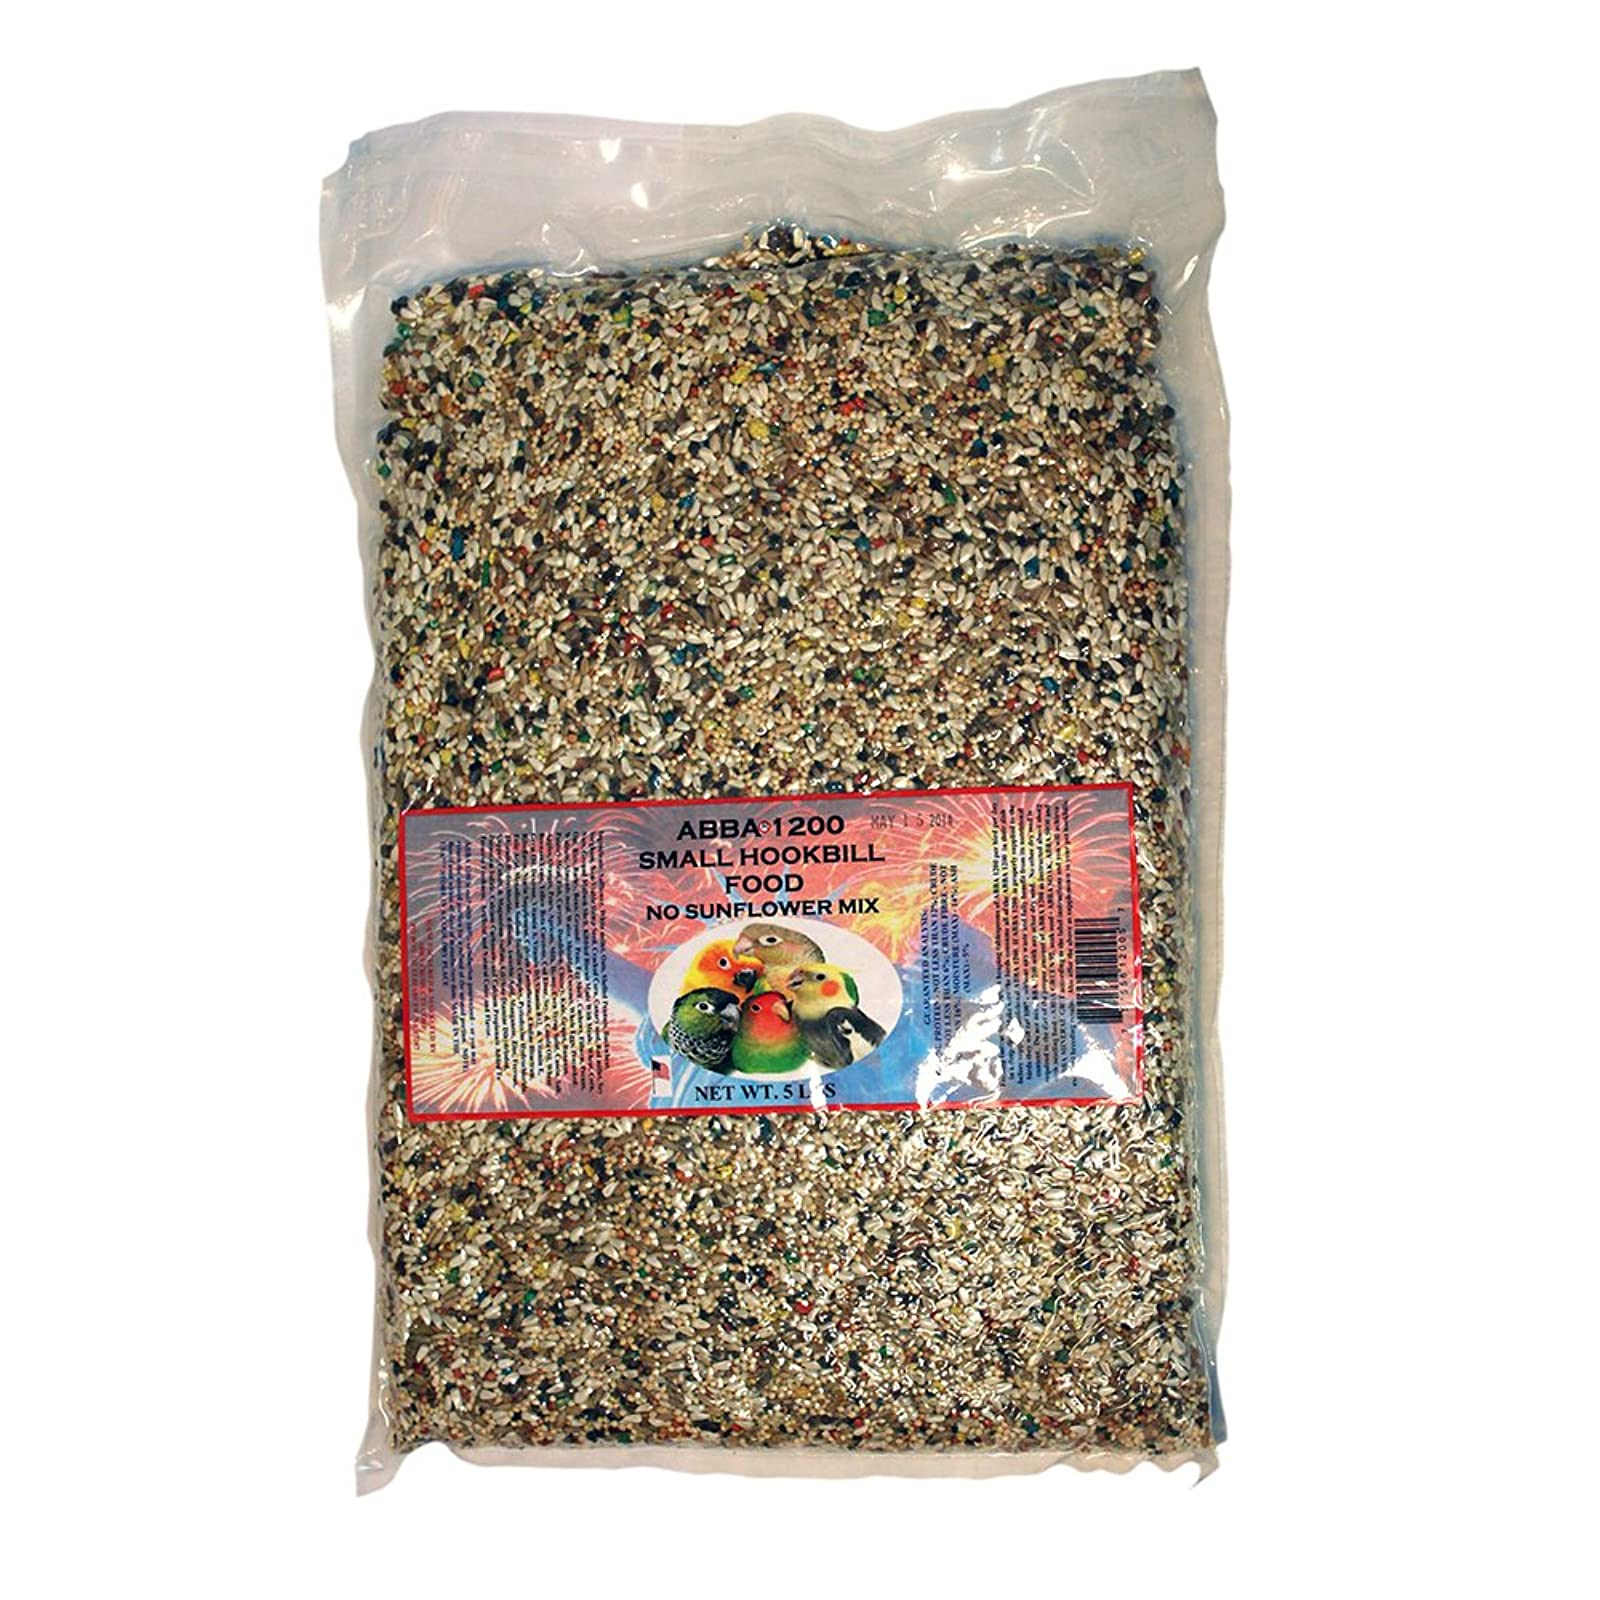 ABBA 1200 Bird Foods Small Hookbill No - 1